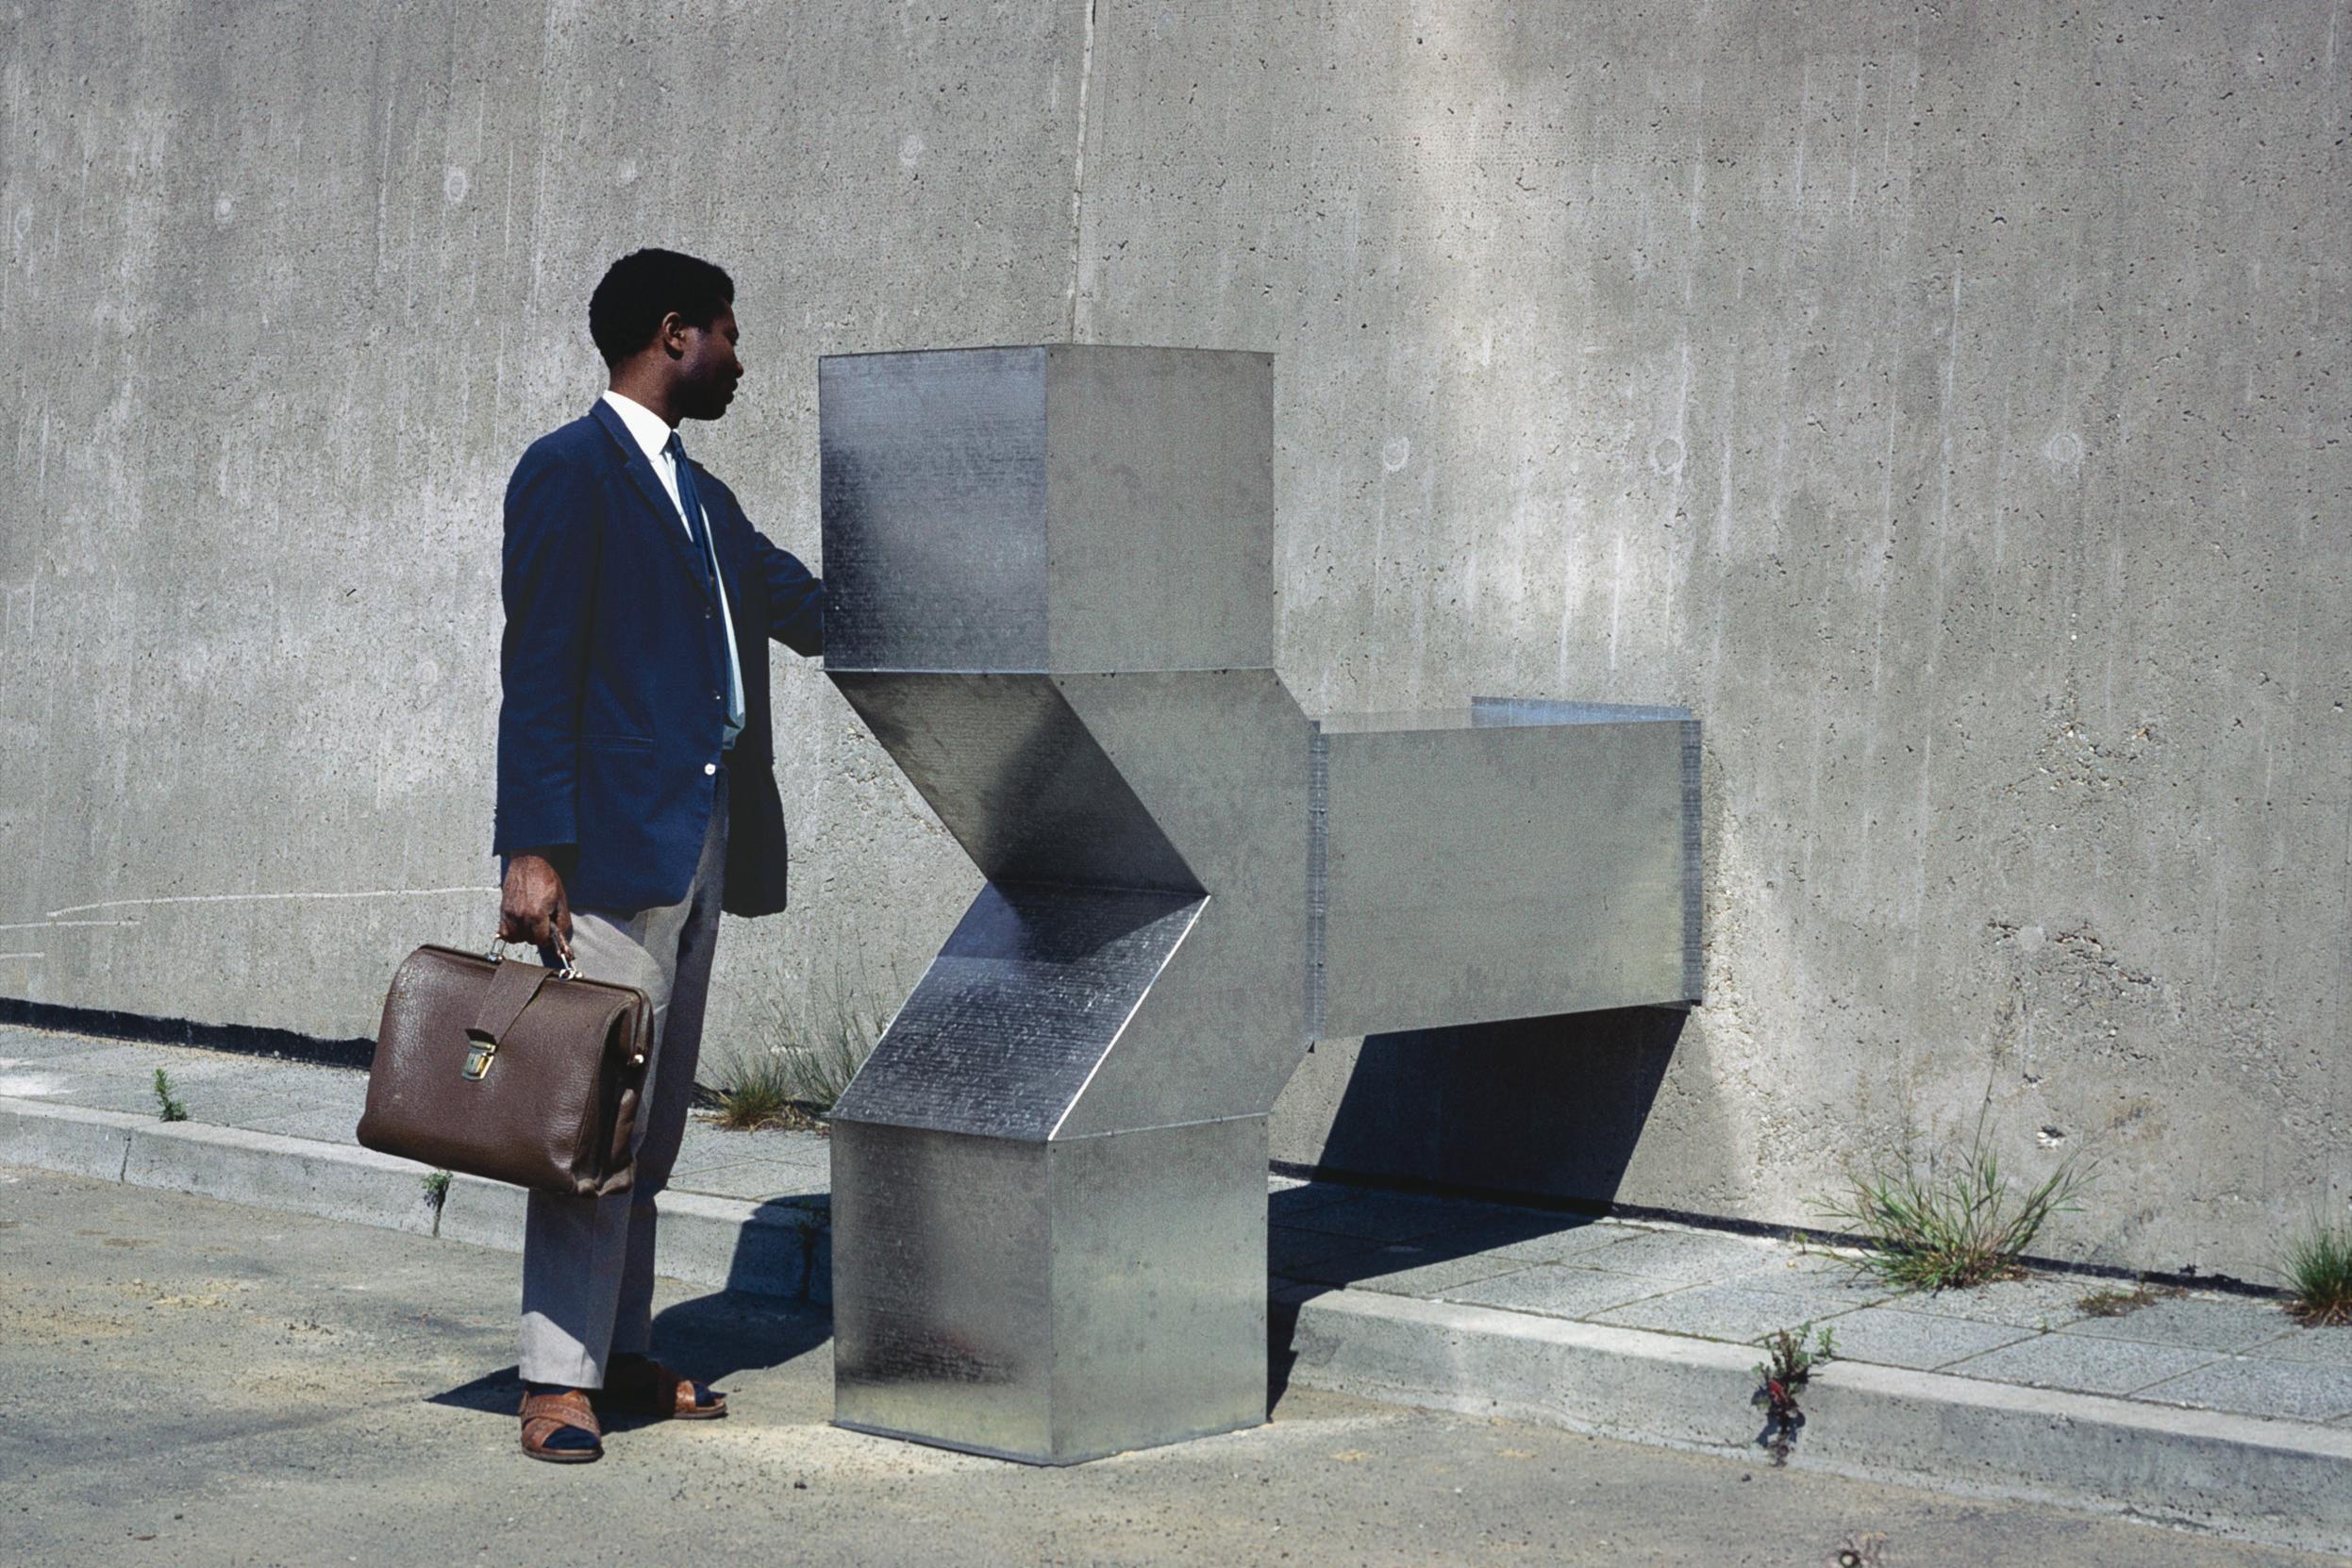 Charlotte Posenenske Made Radically Accessible Minimalist Sculpture